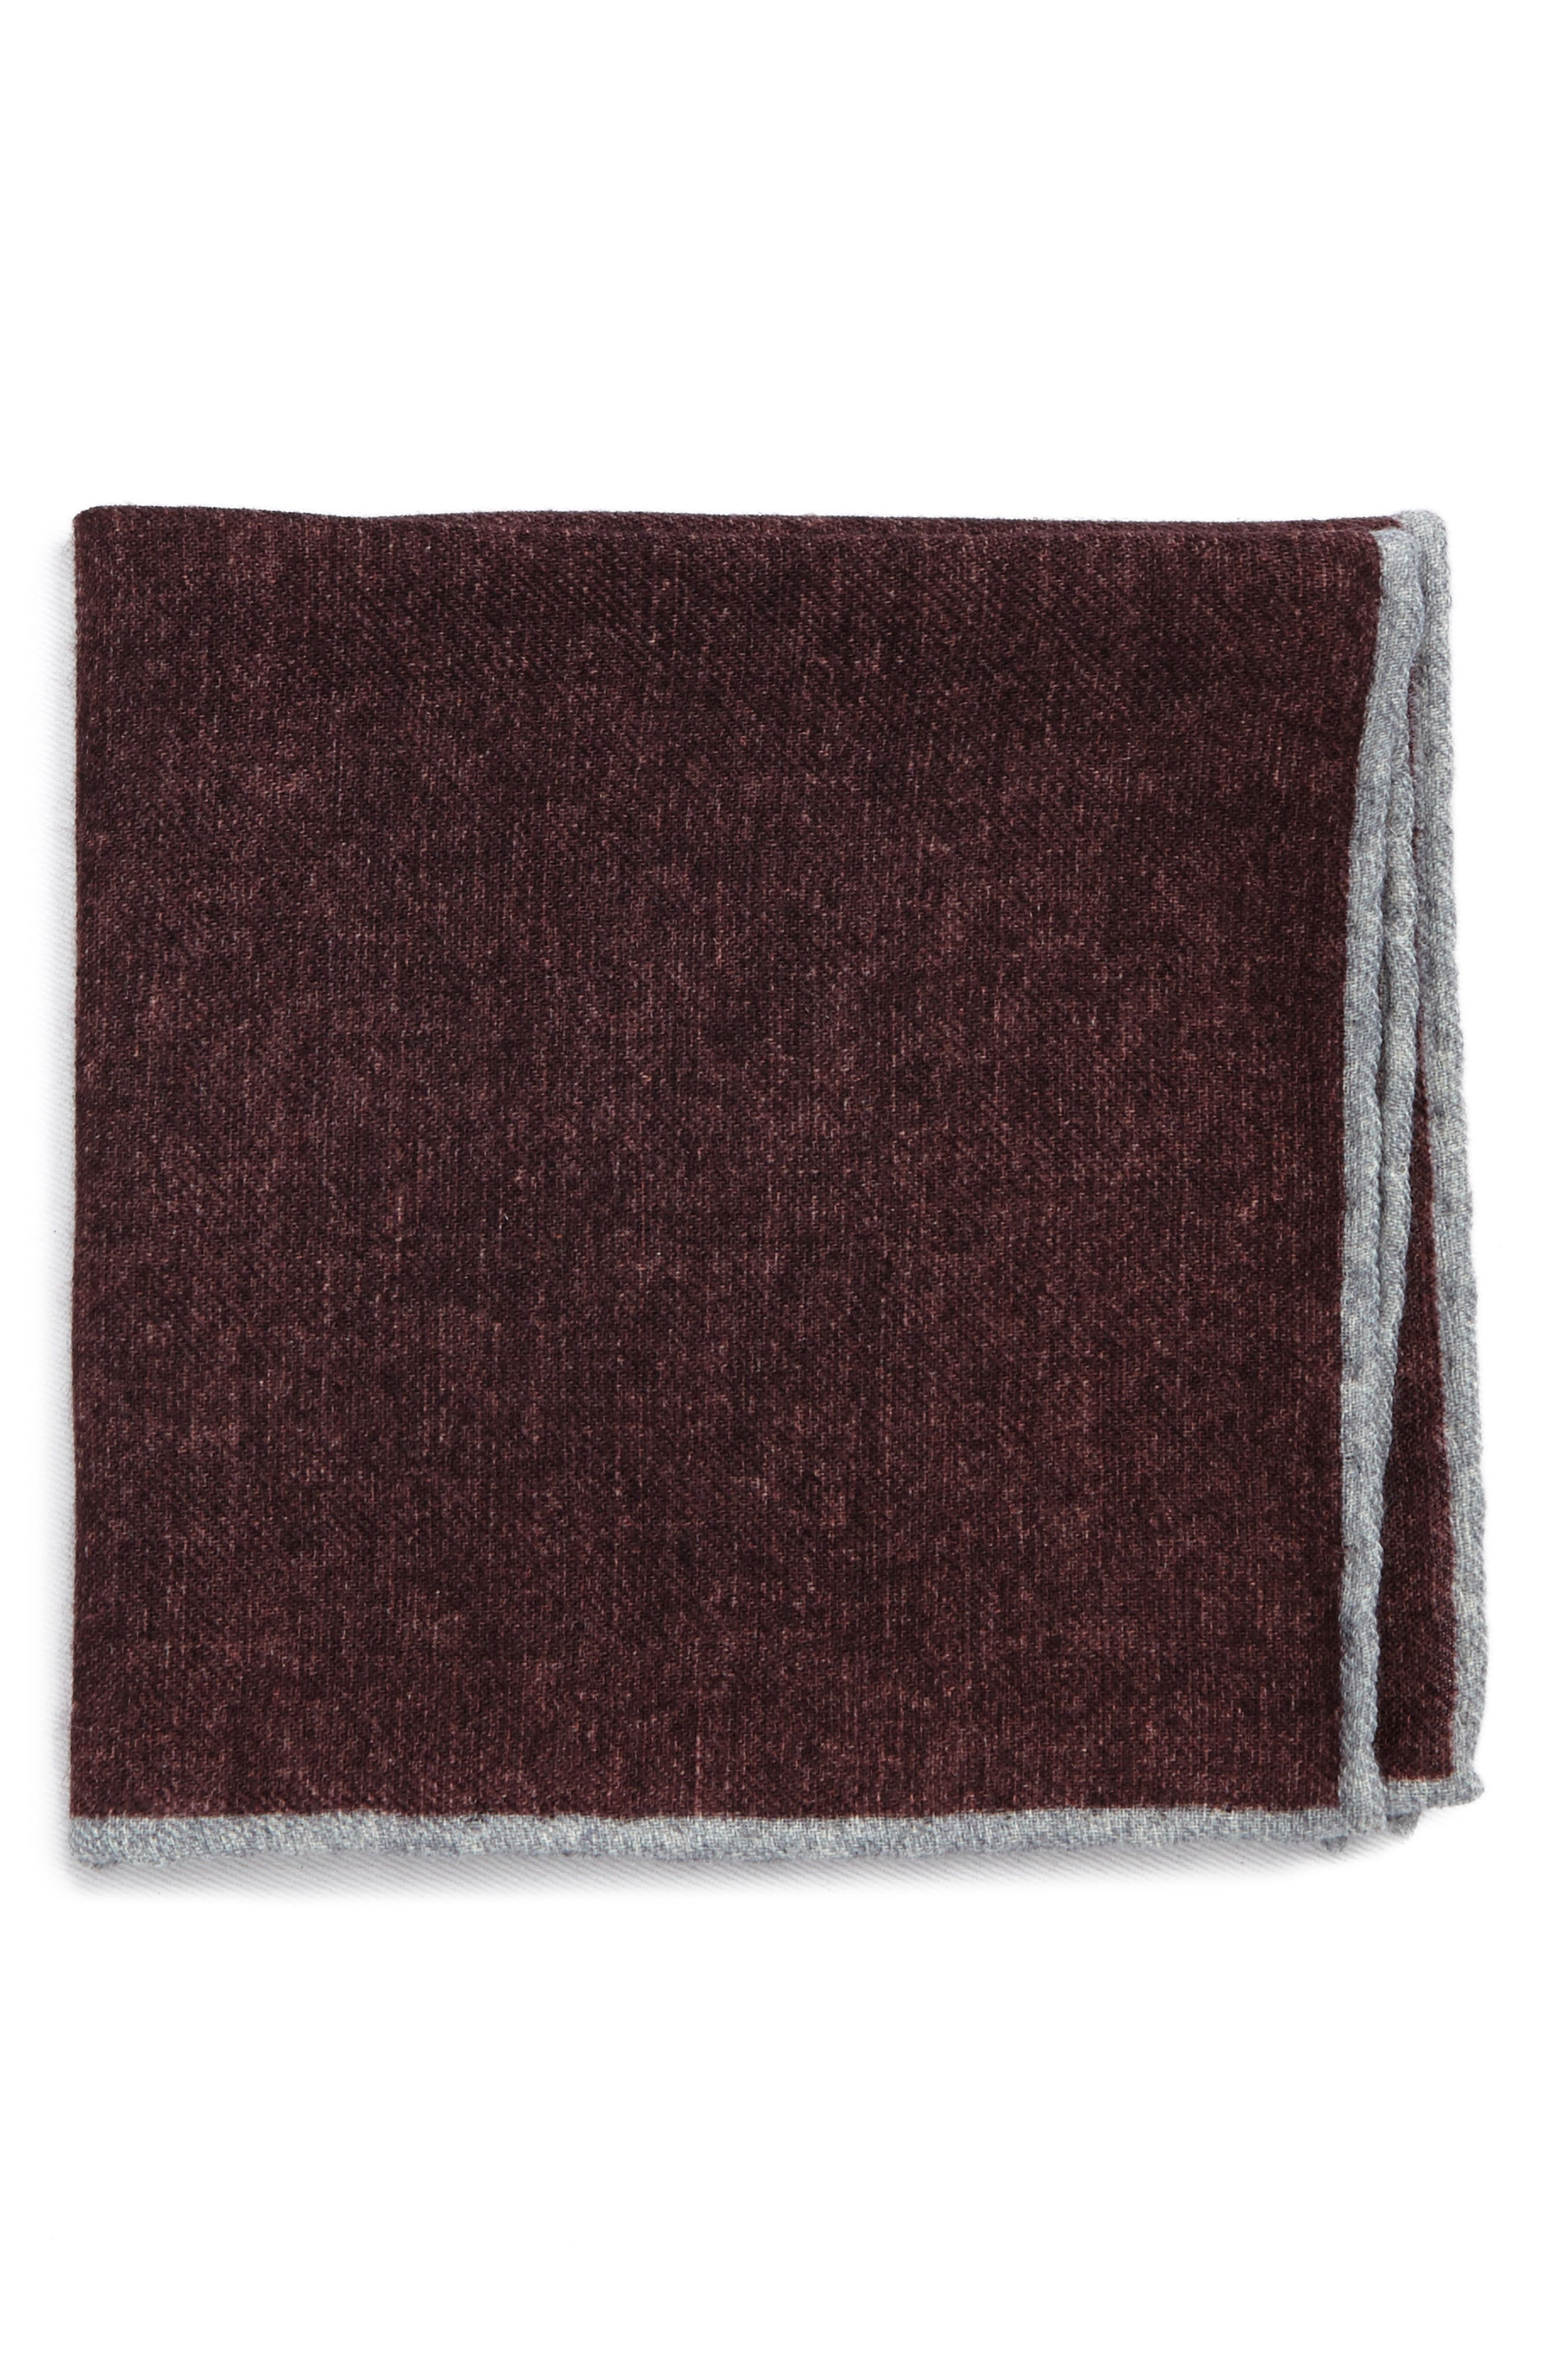 Main Image - Eleventy Flannel Wool Pocket Square